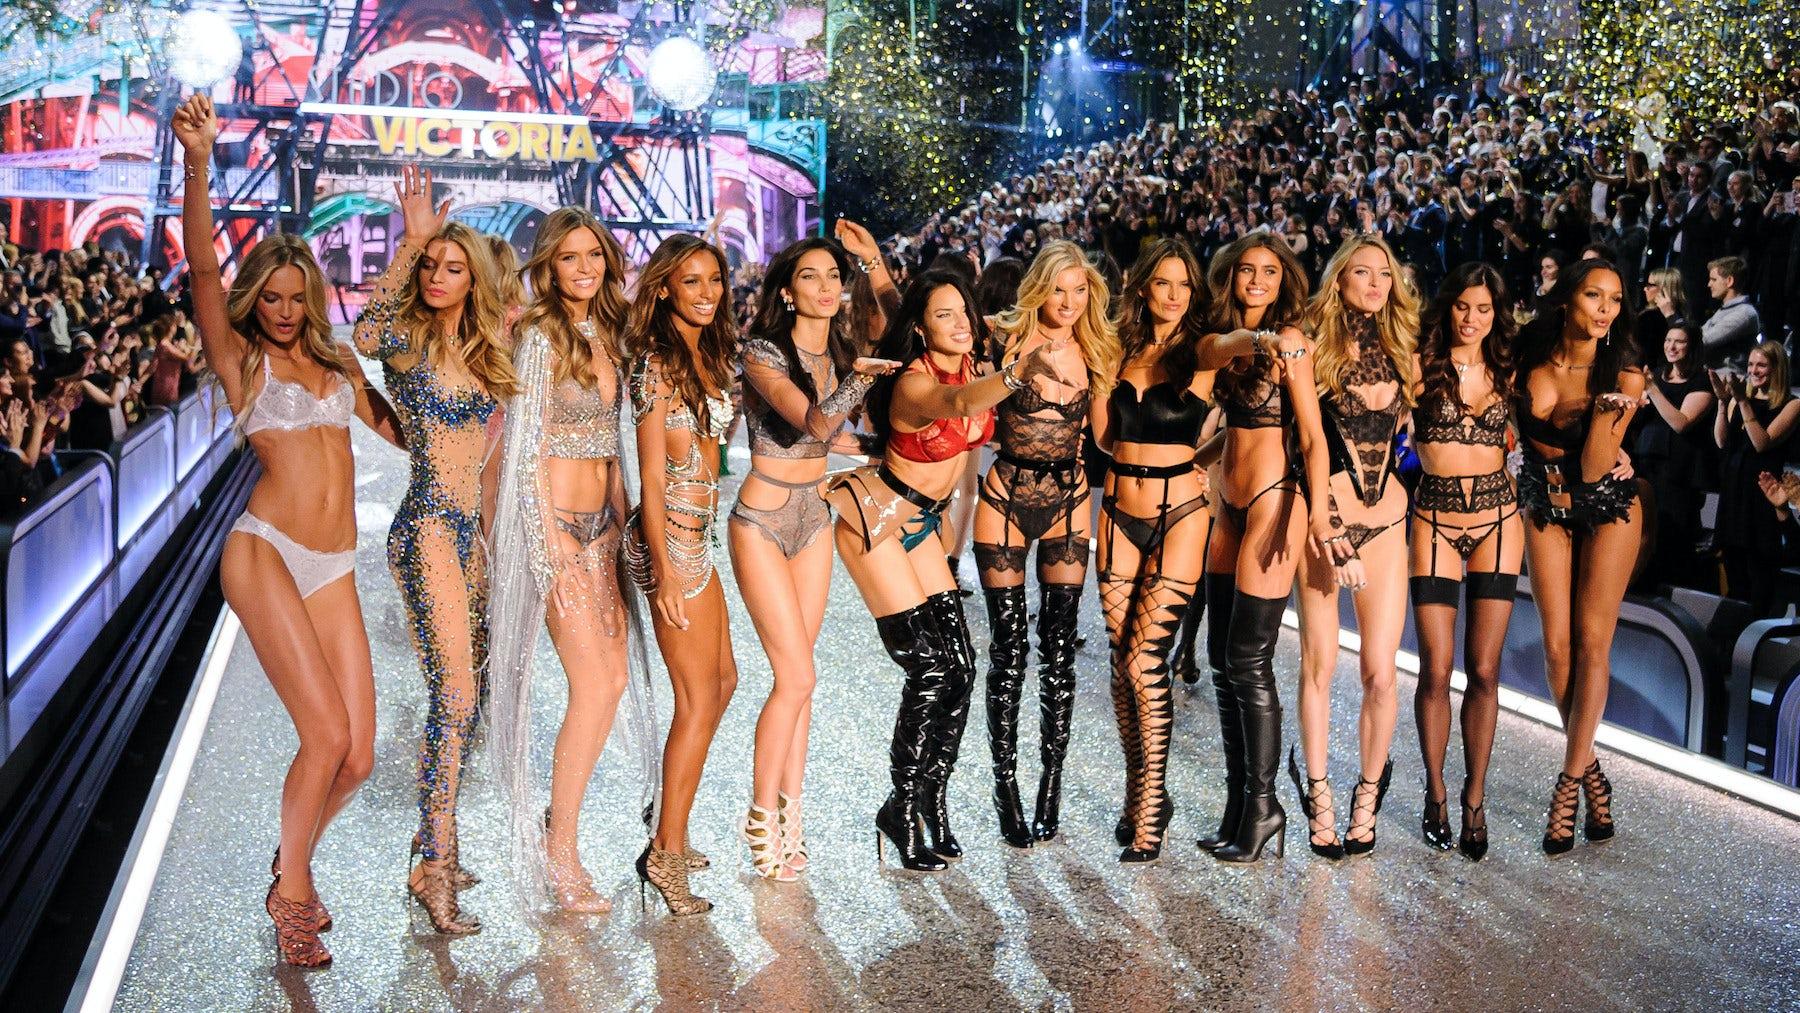 The Victoria's Secret show in November 2016 | Source: Shutterstock